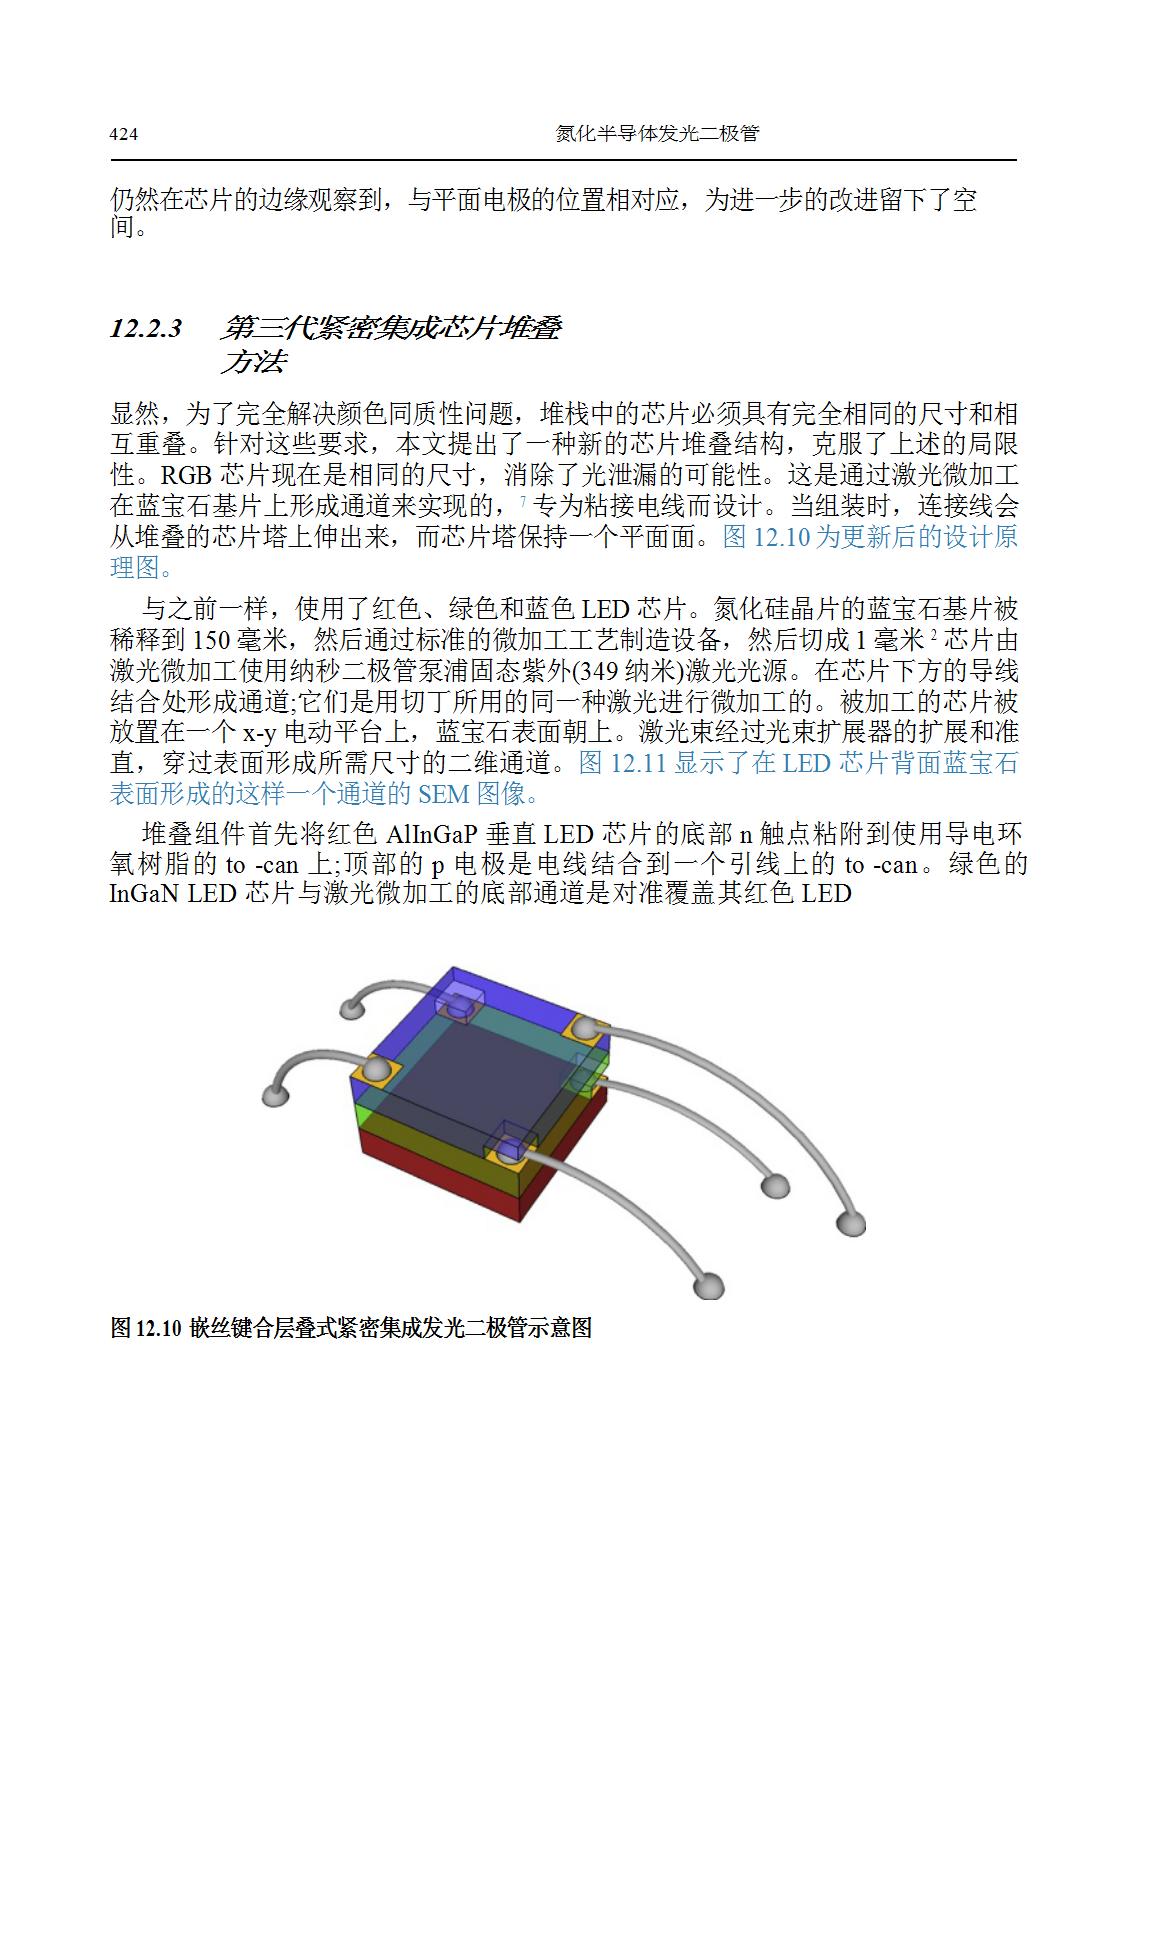 LED调色和像素化MicroLED阵列研究  第10张